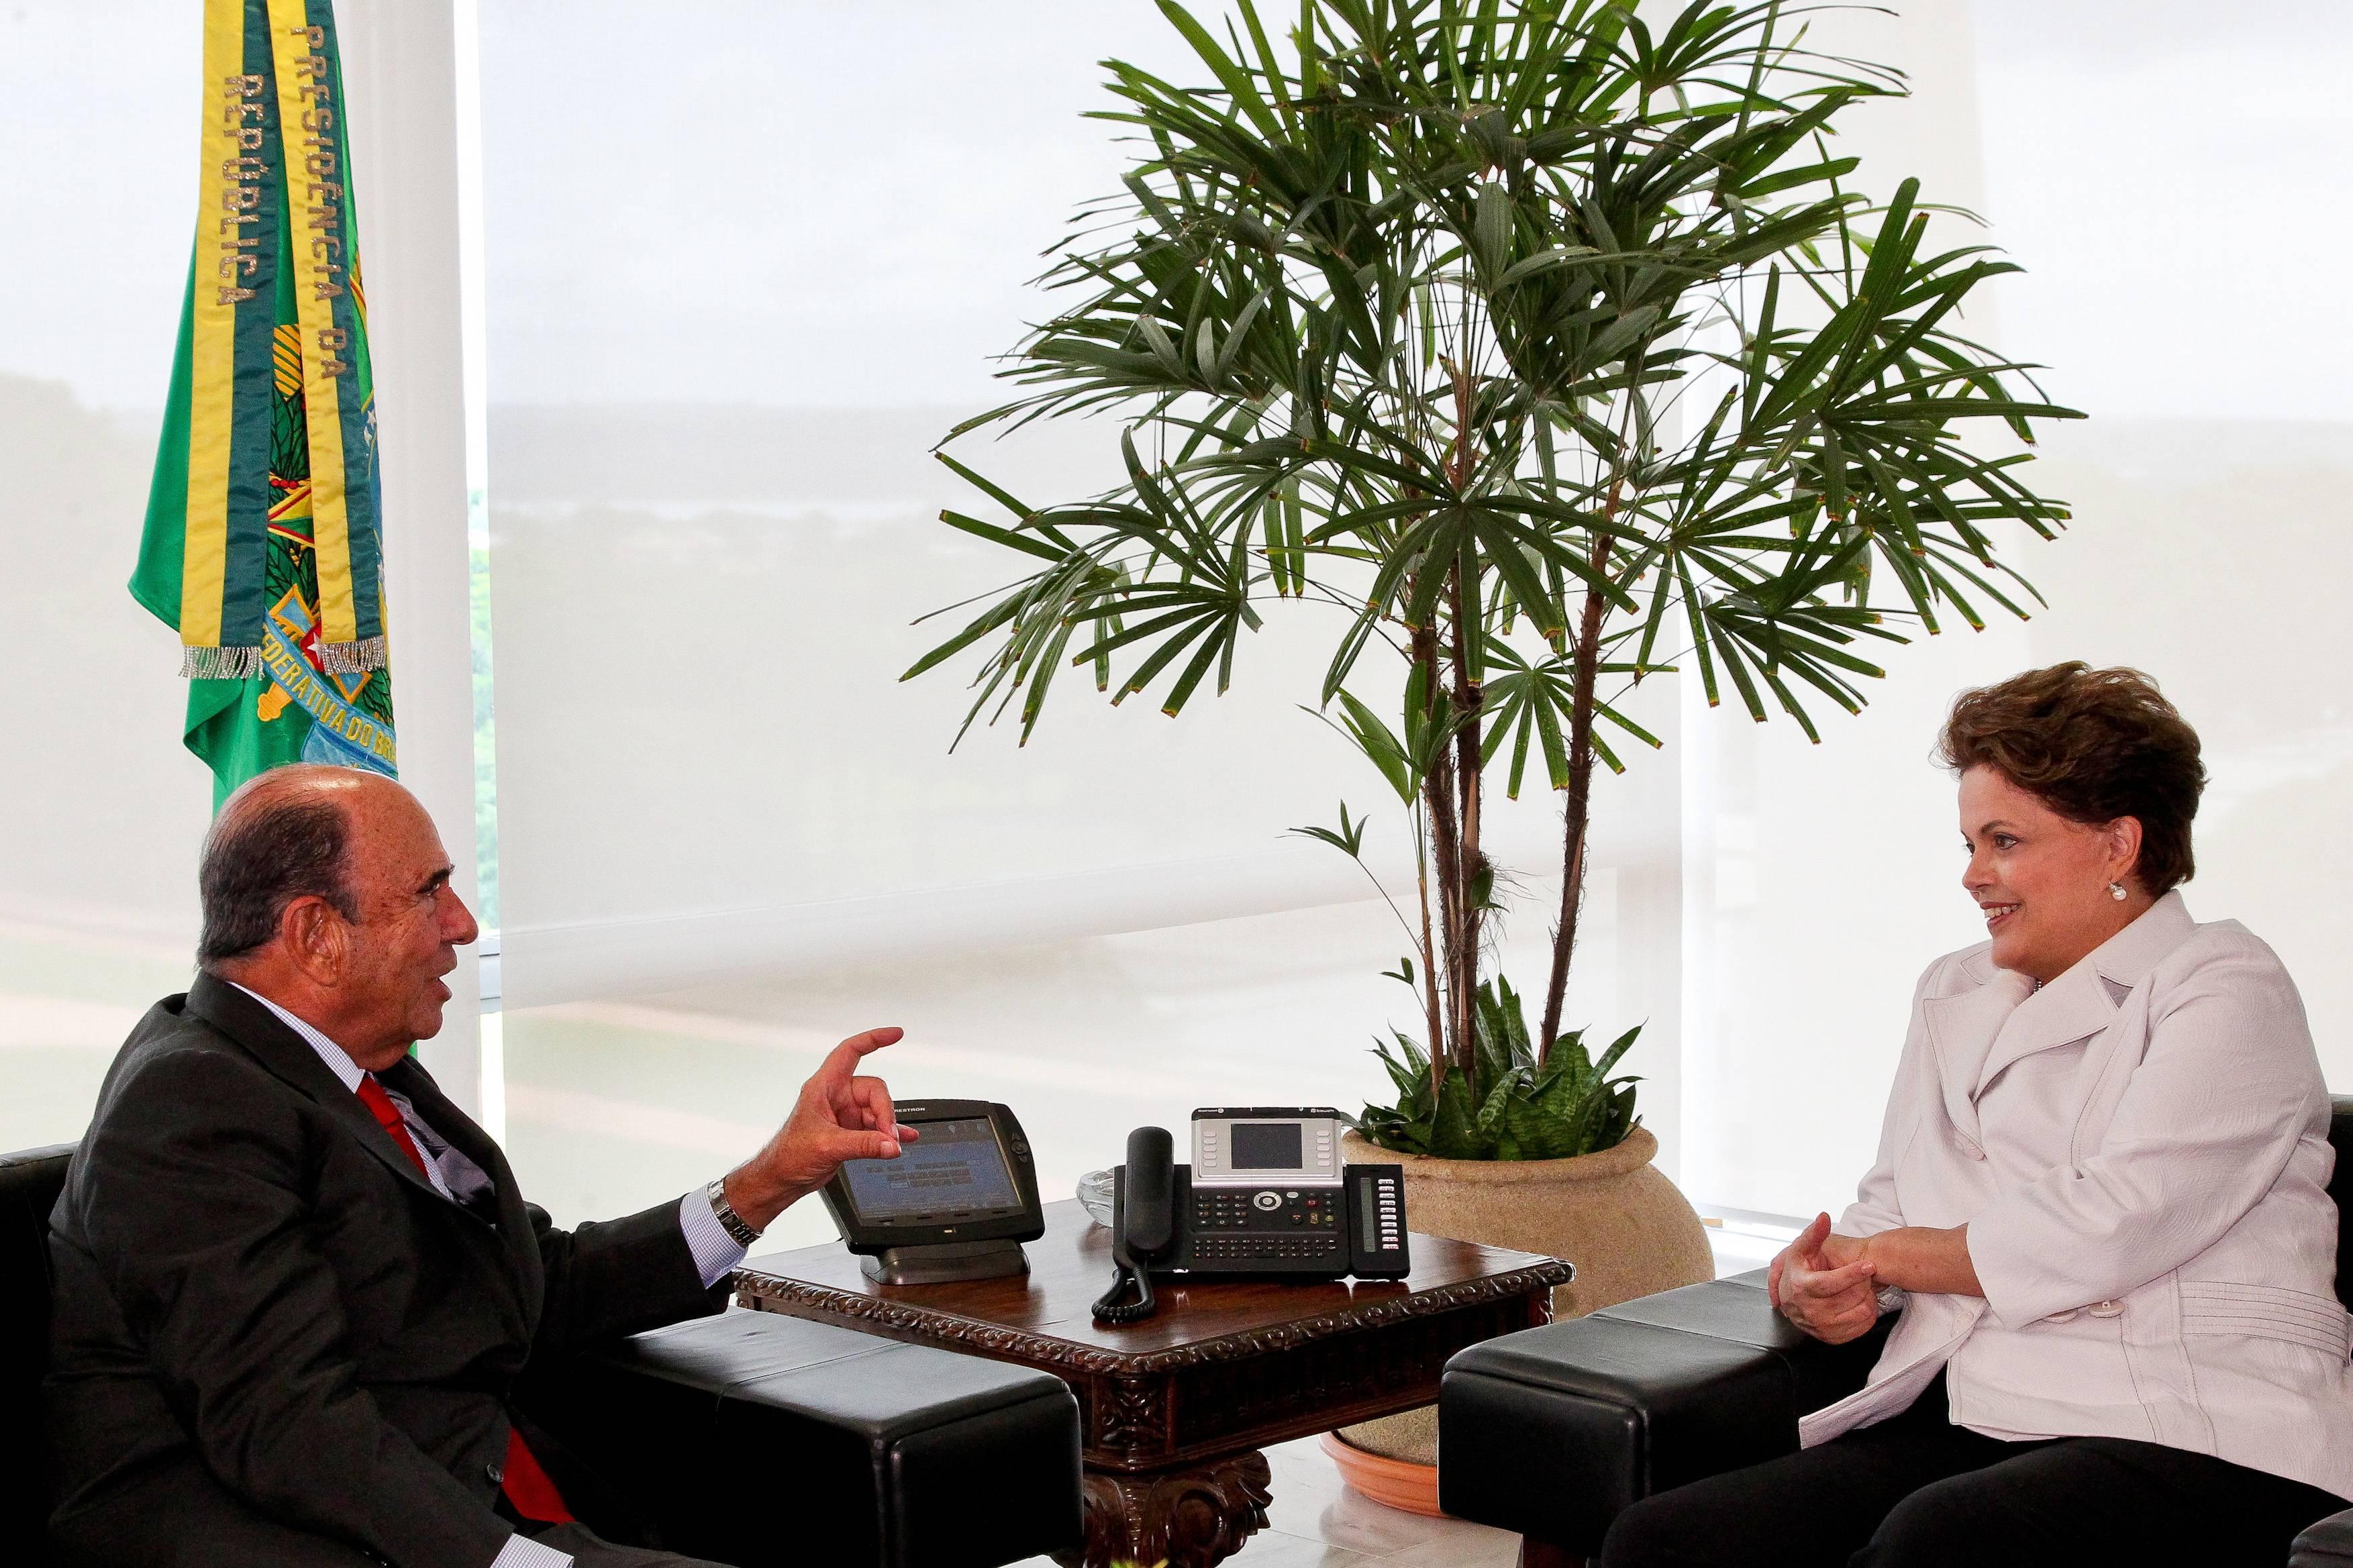 Emilio_Botín_Presidente_mundial_do_Grupo_Santander_(22.11.2011)_04